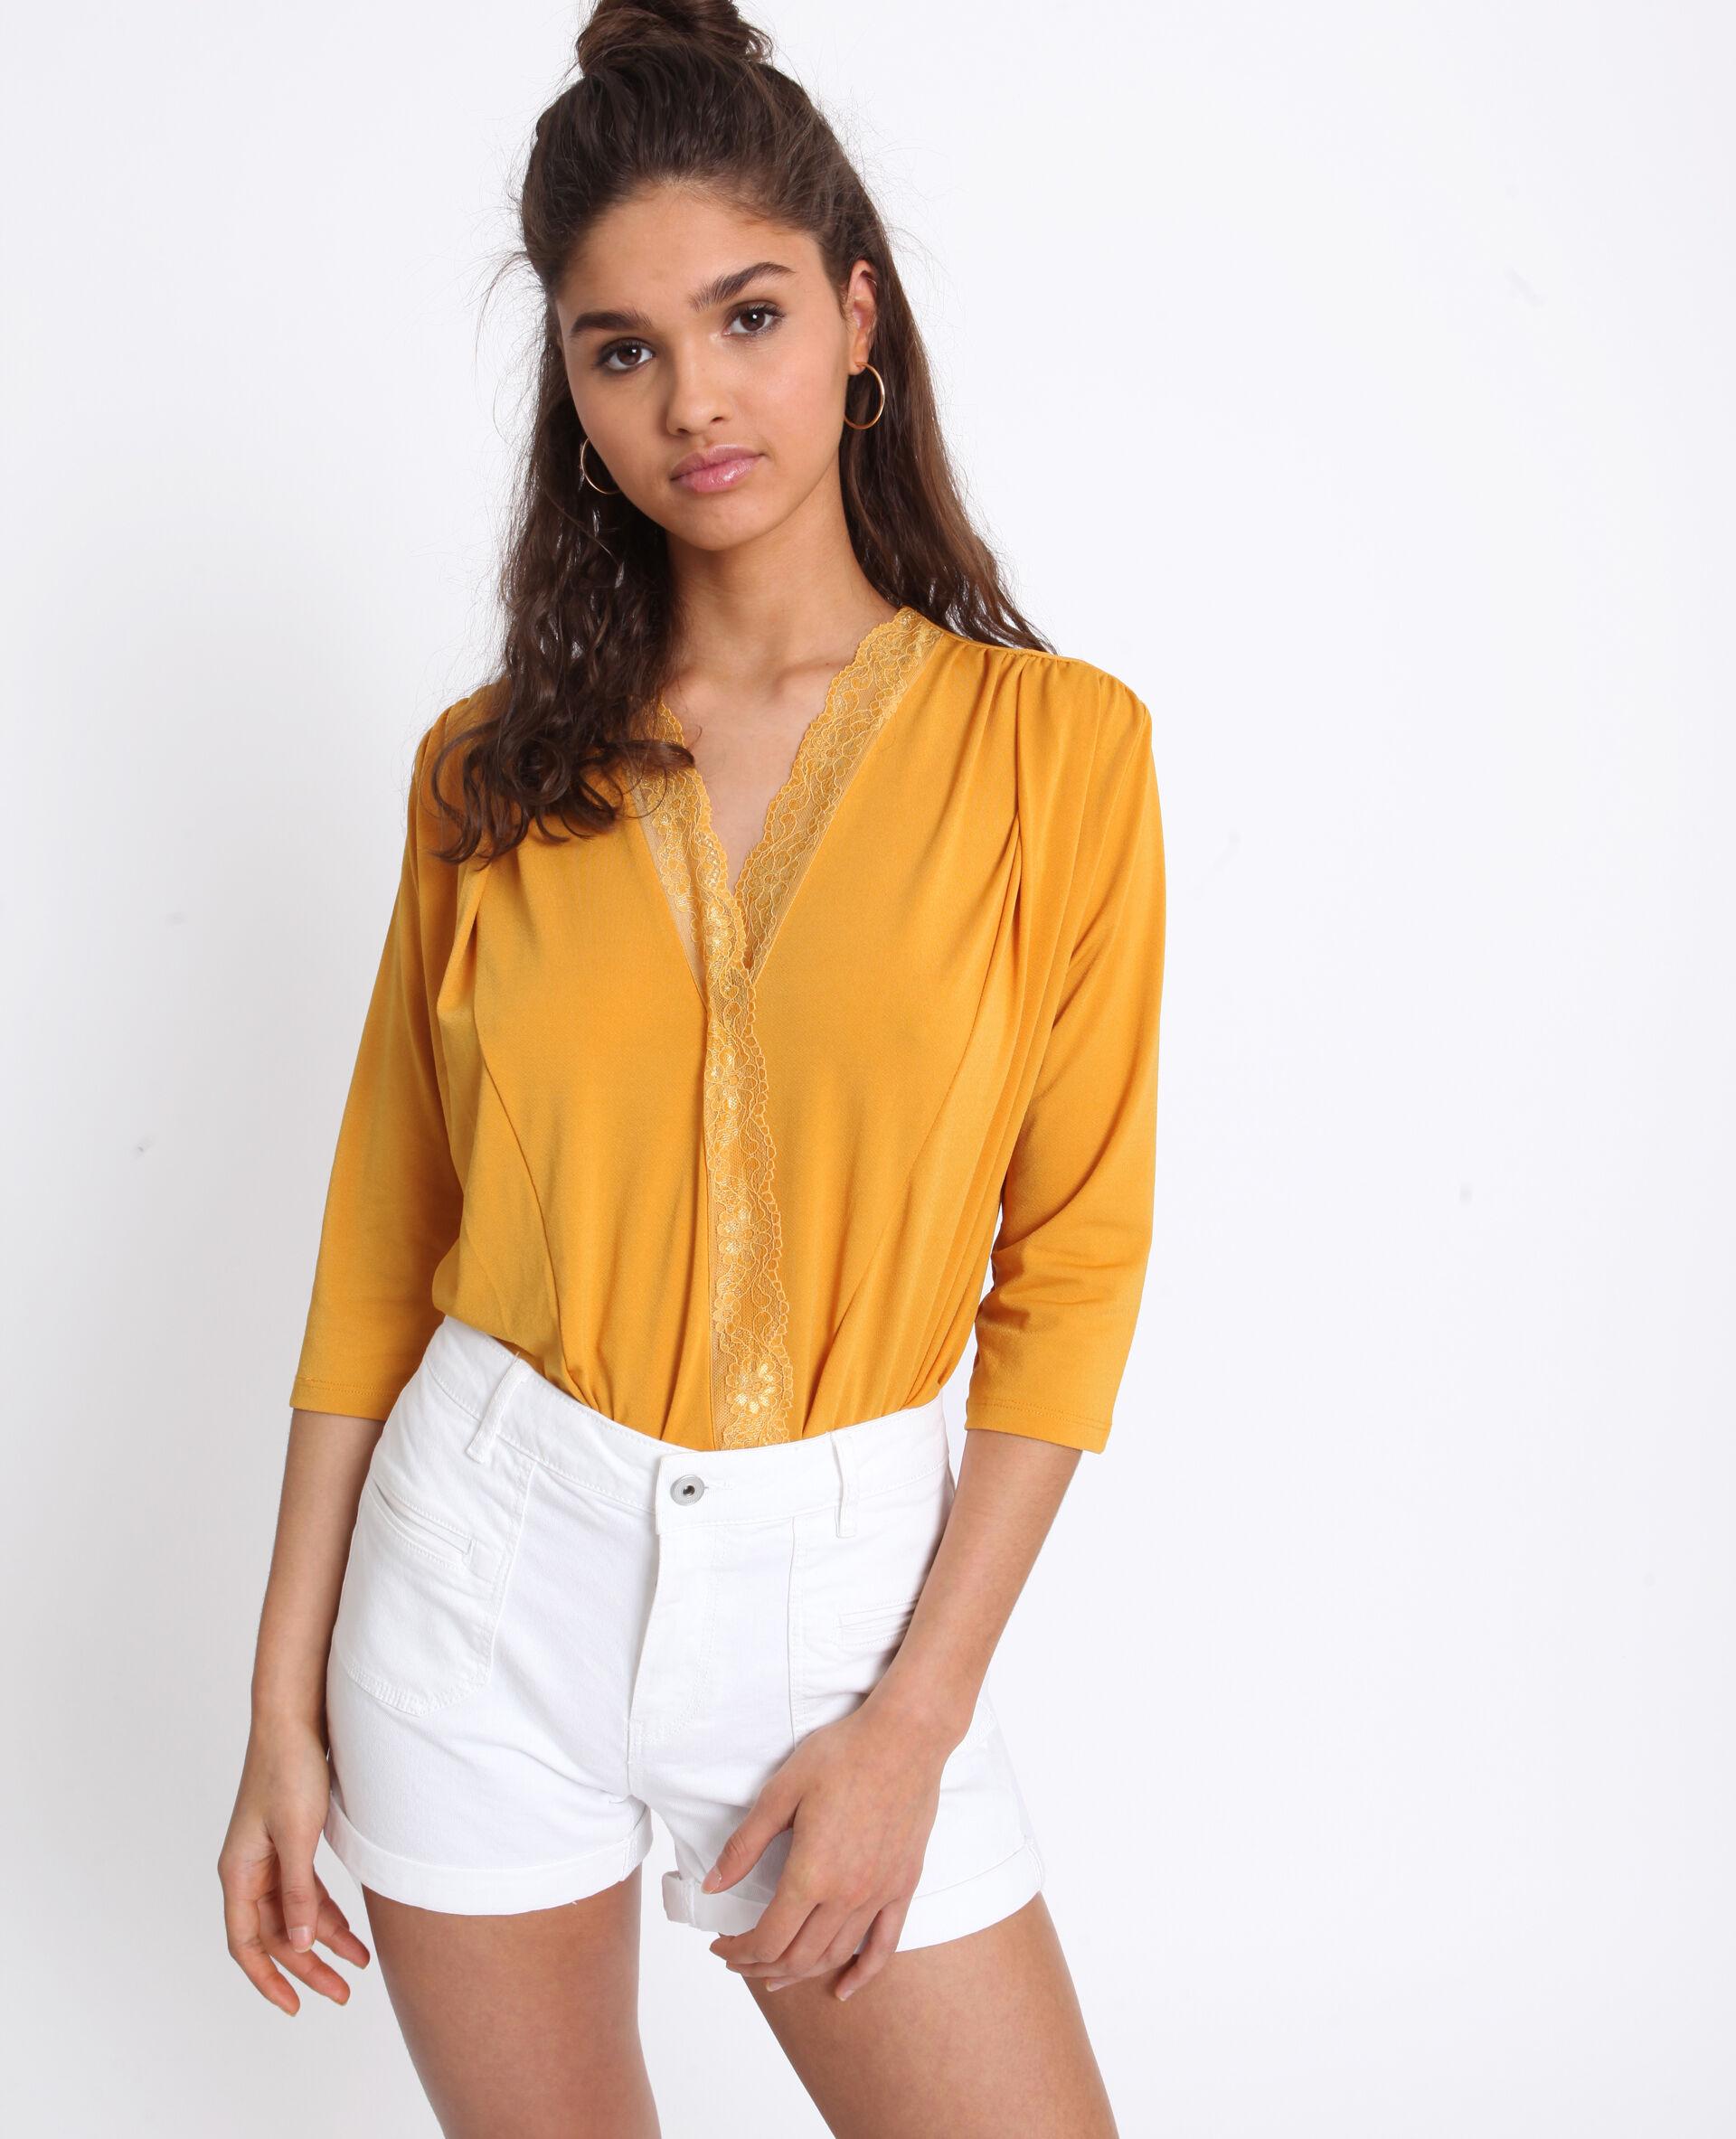 ✅Body chemisier en dentelle Femme - Couleur jaune - Taille XS - PIMKIE - MODE FEMME